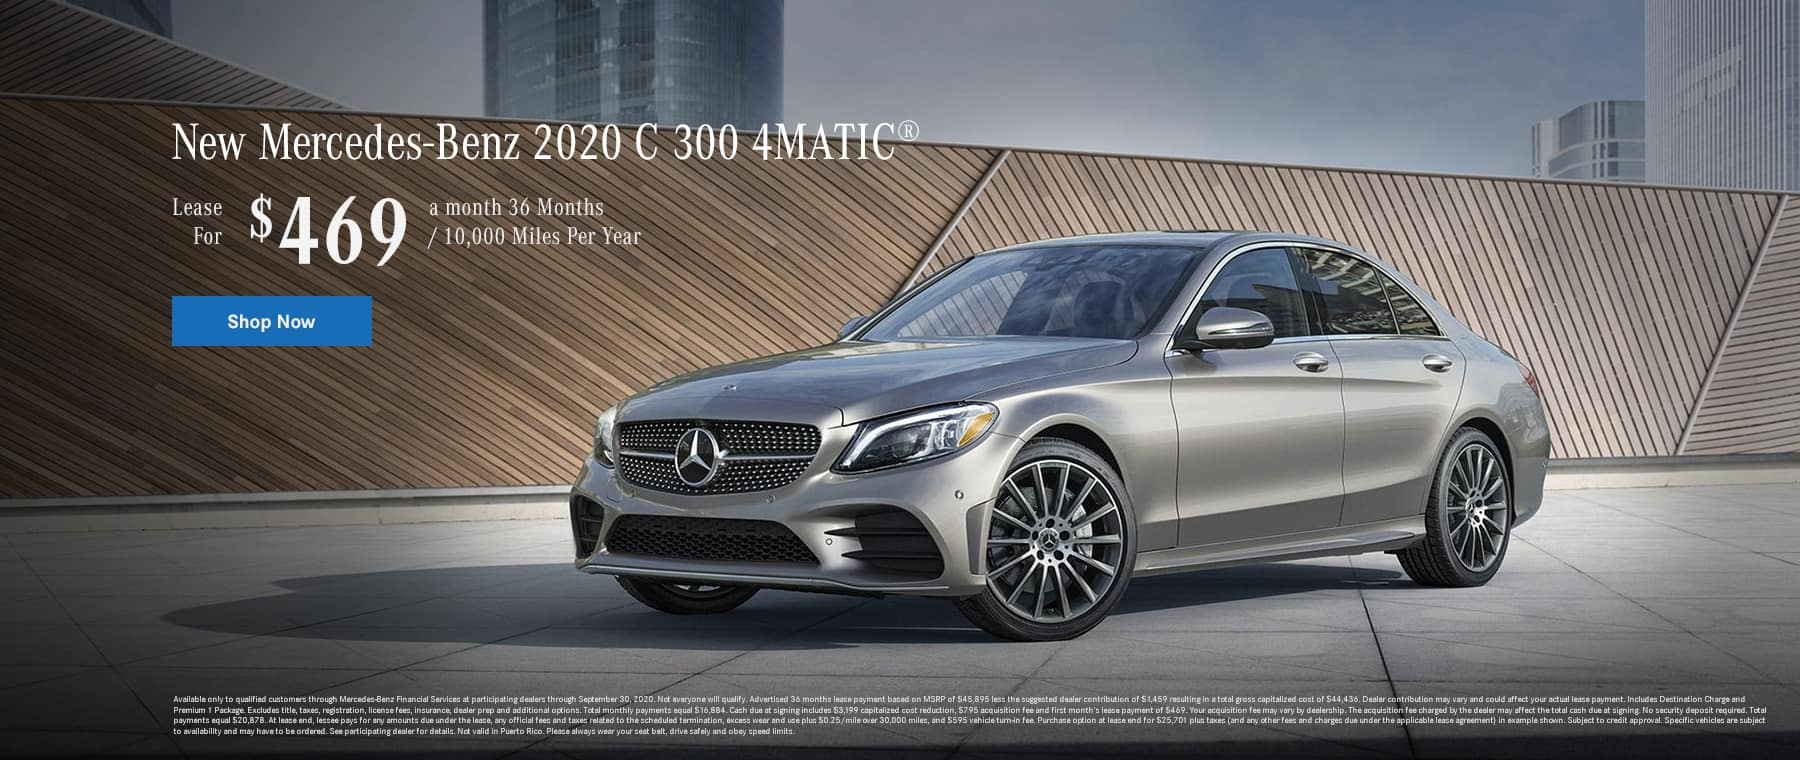 2020 C 300